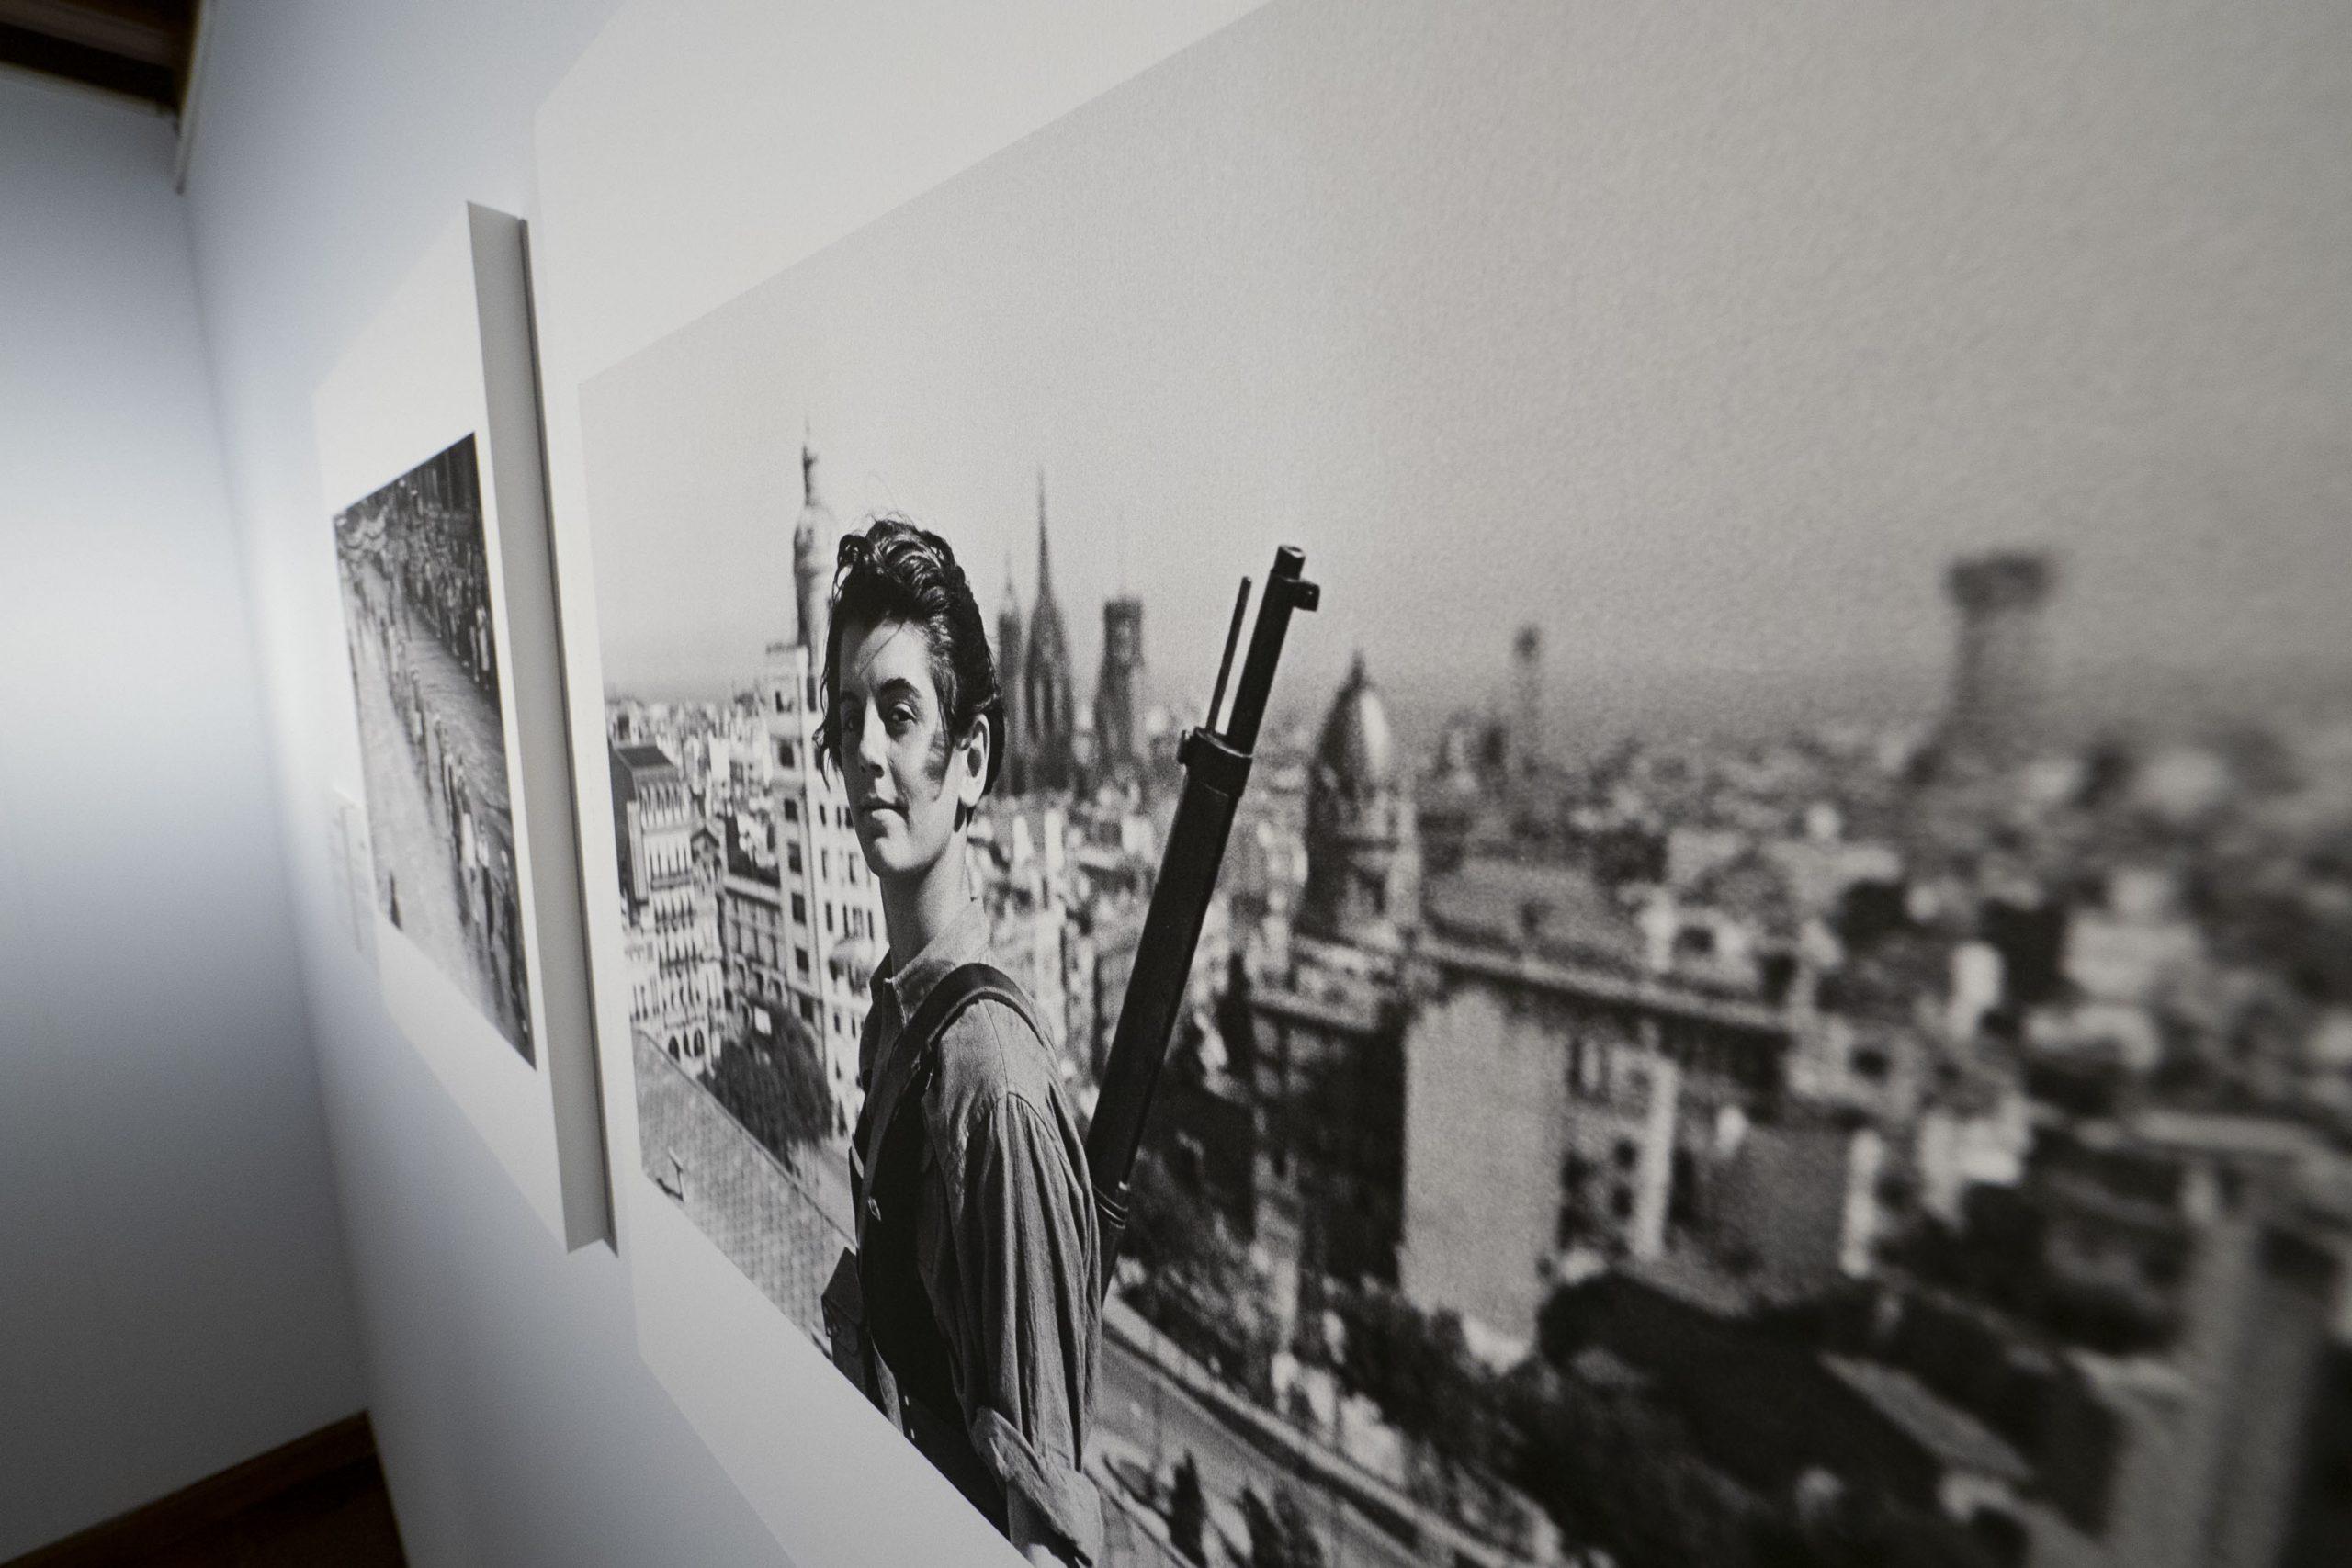 cb Exposicion Imagenes Ineditas de La Guerra Civil12 scaled